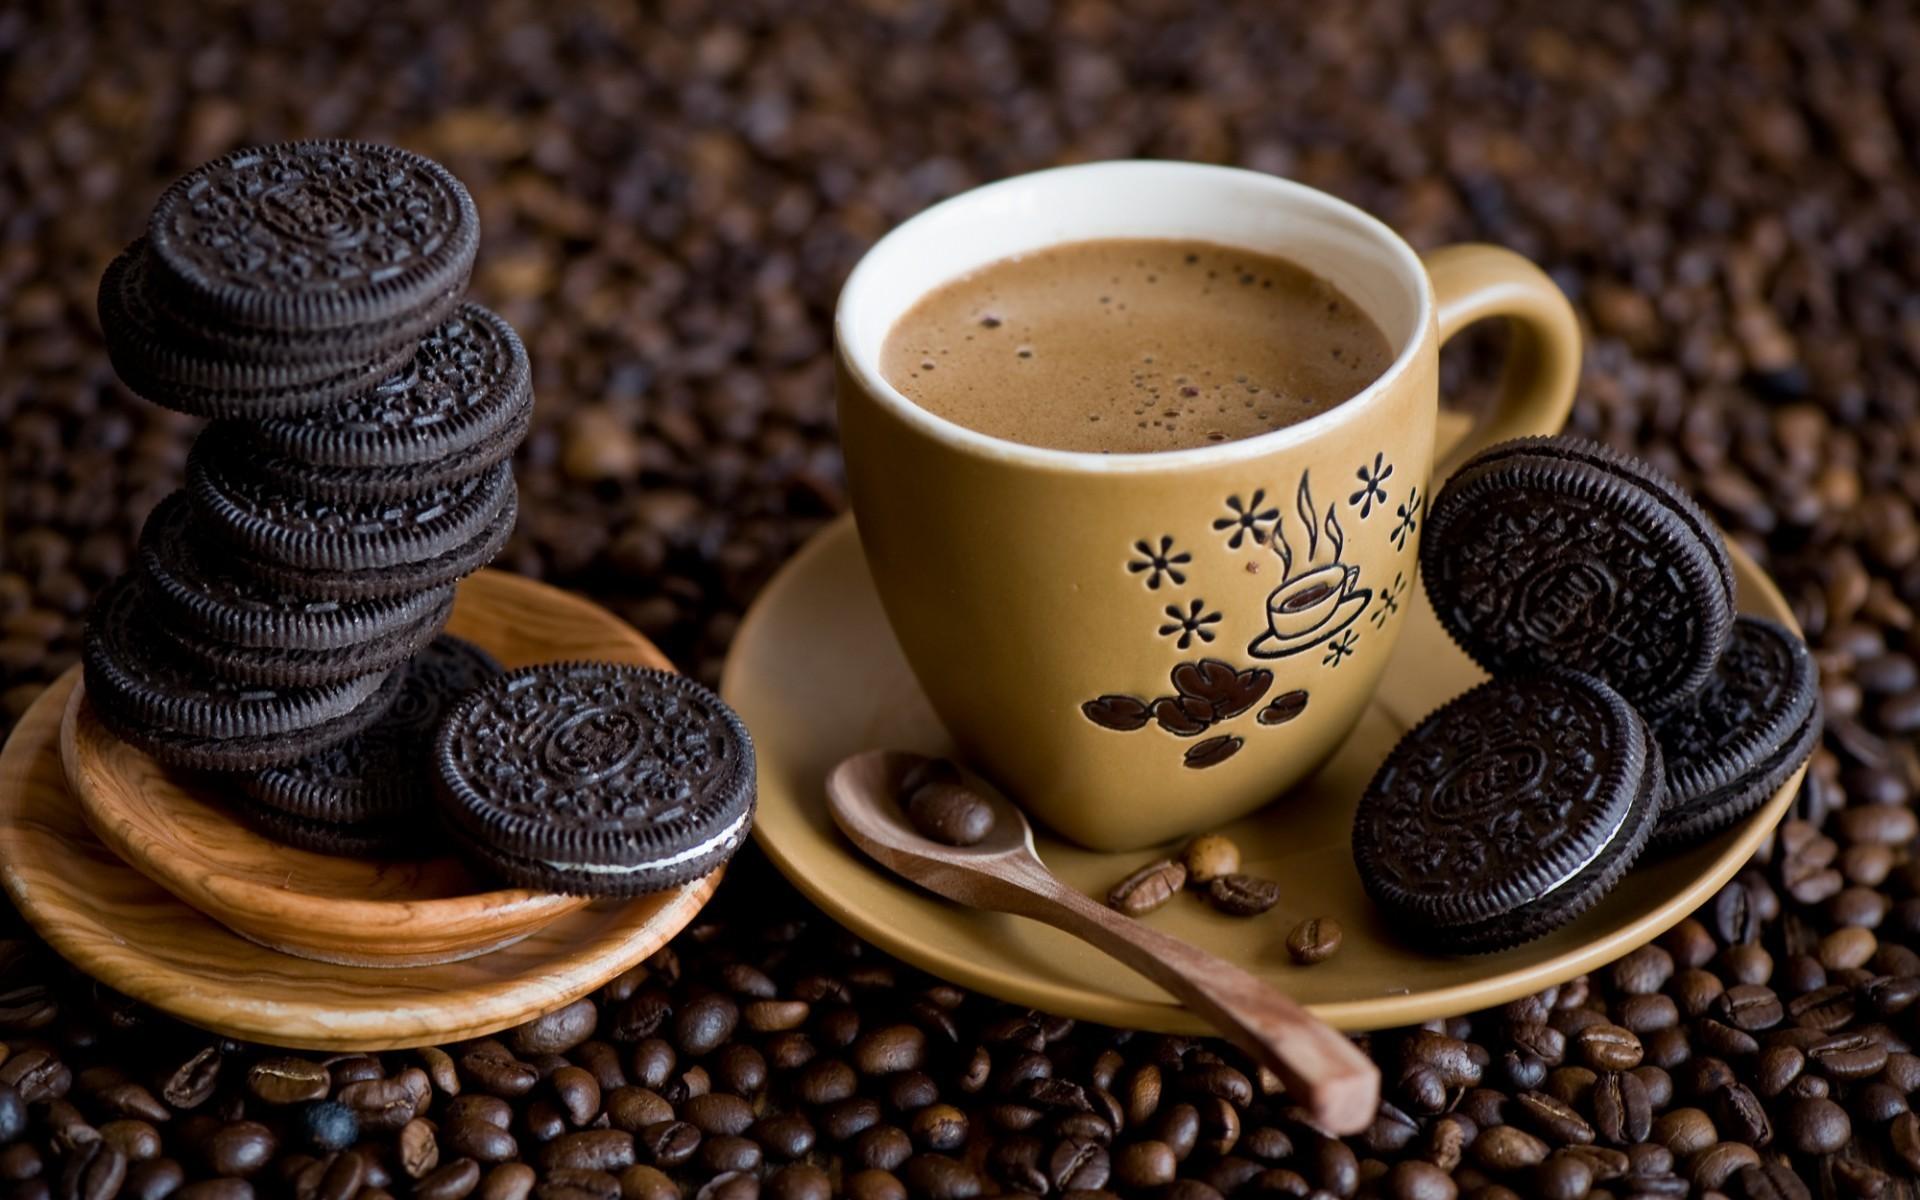 Сочетание кофе и антибиотиков